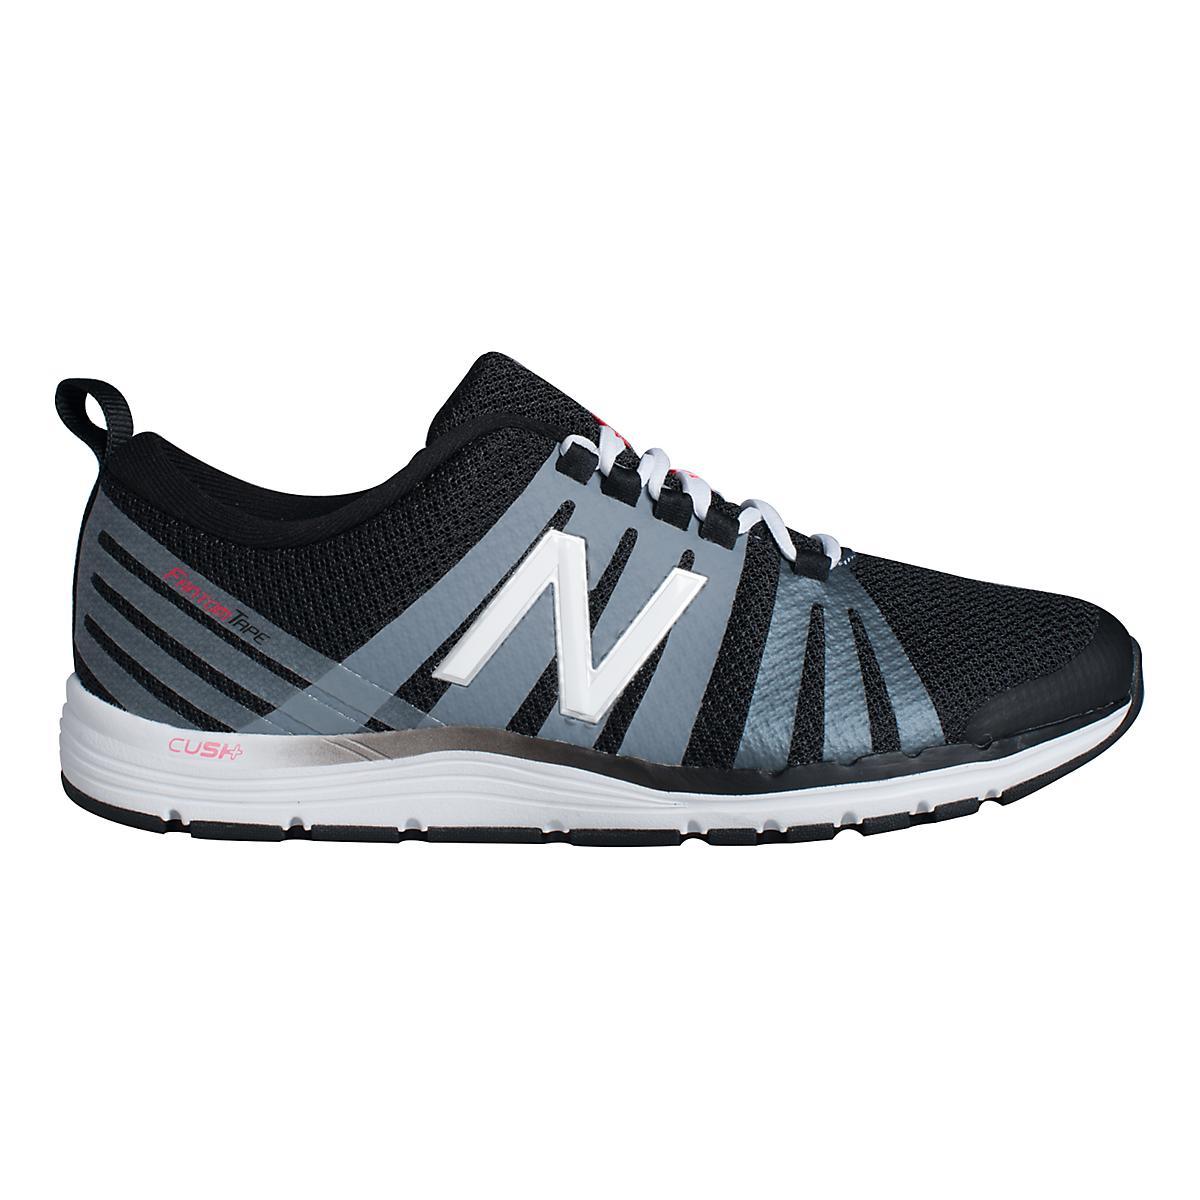 Reebok Men S Trail Runner Shoe